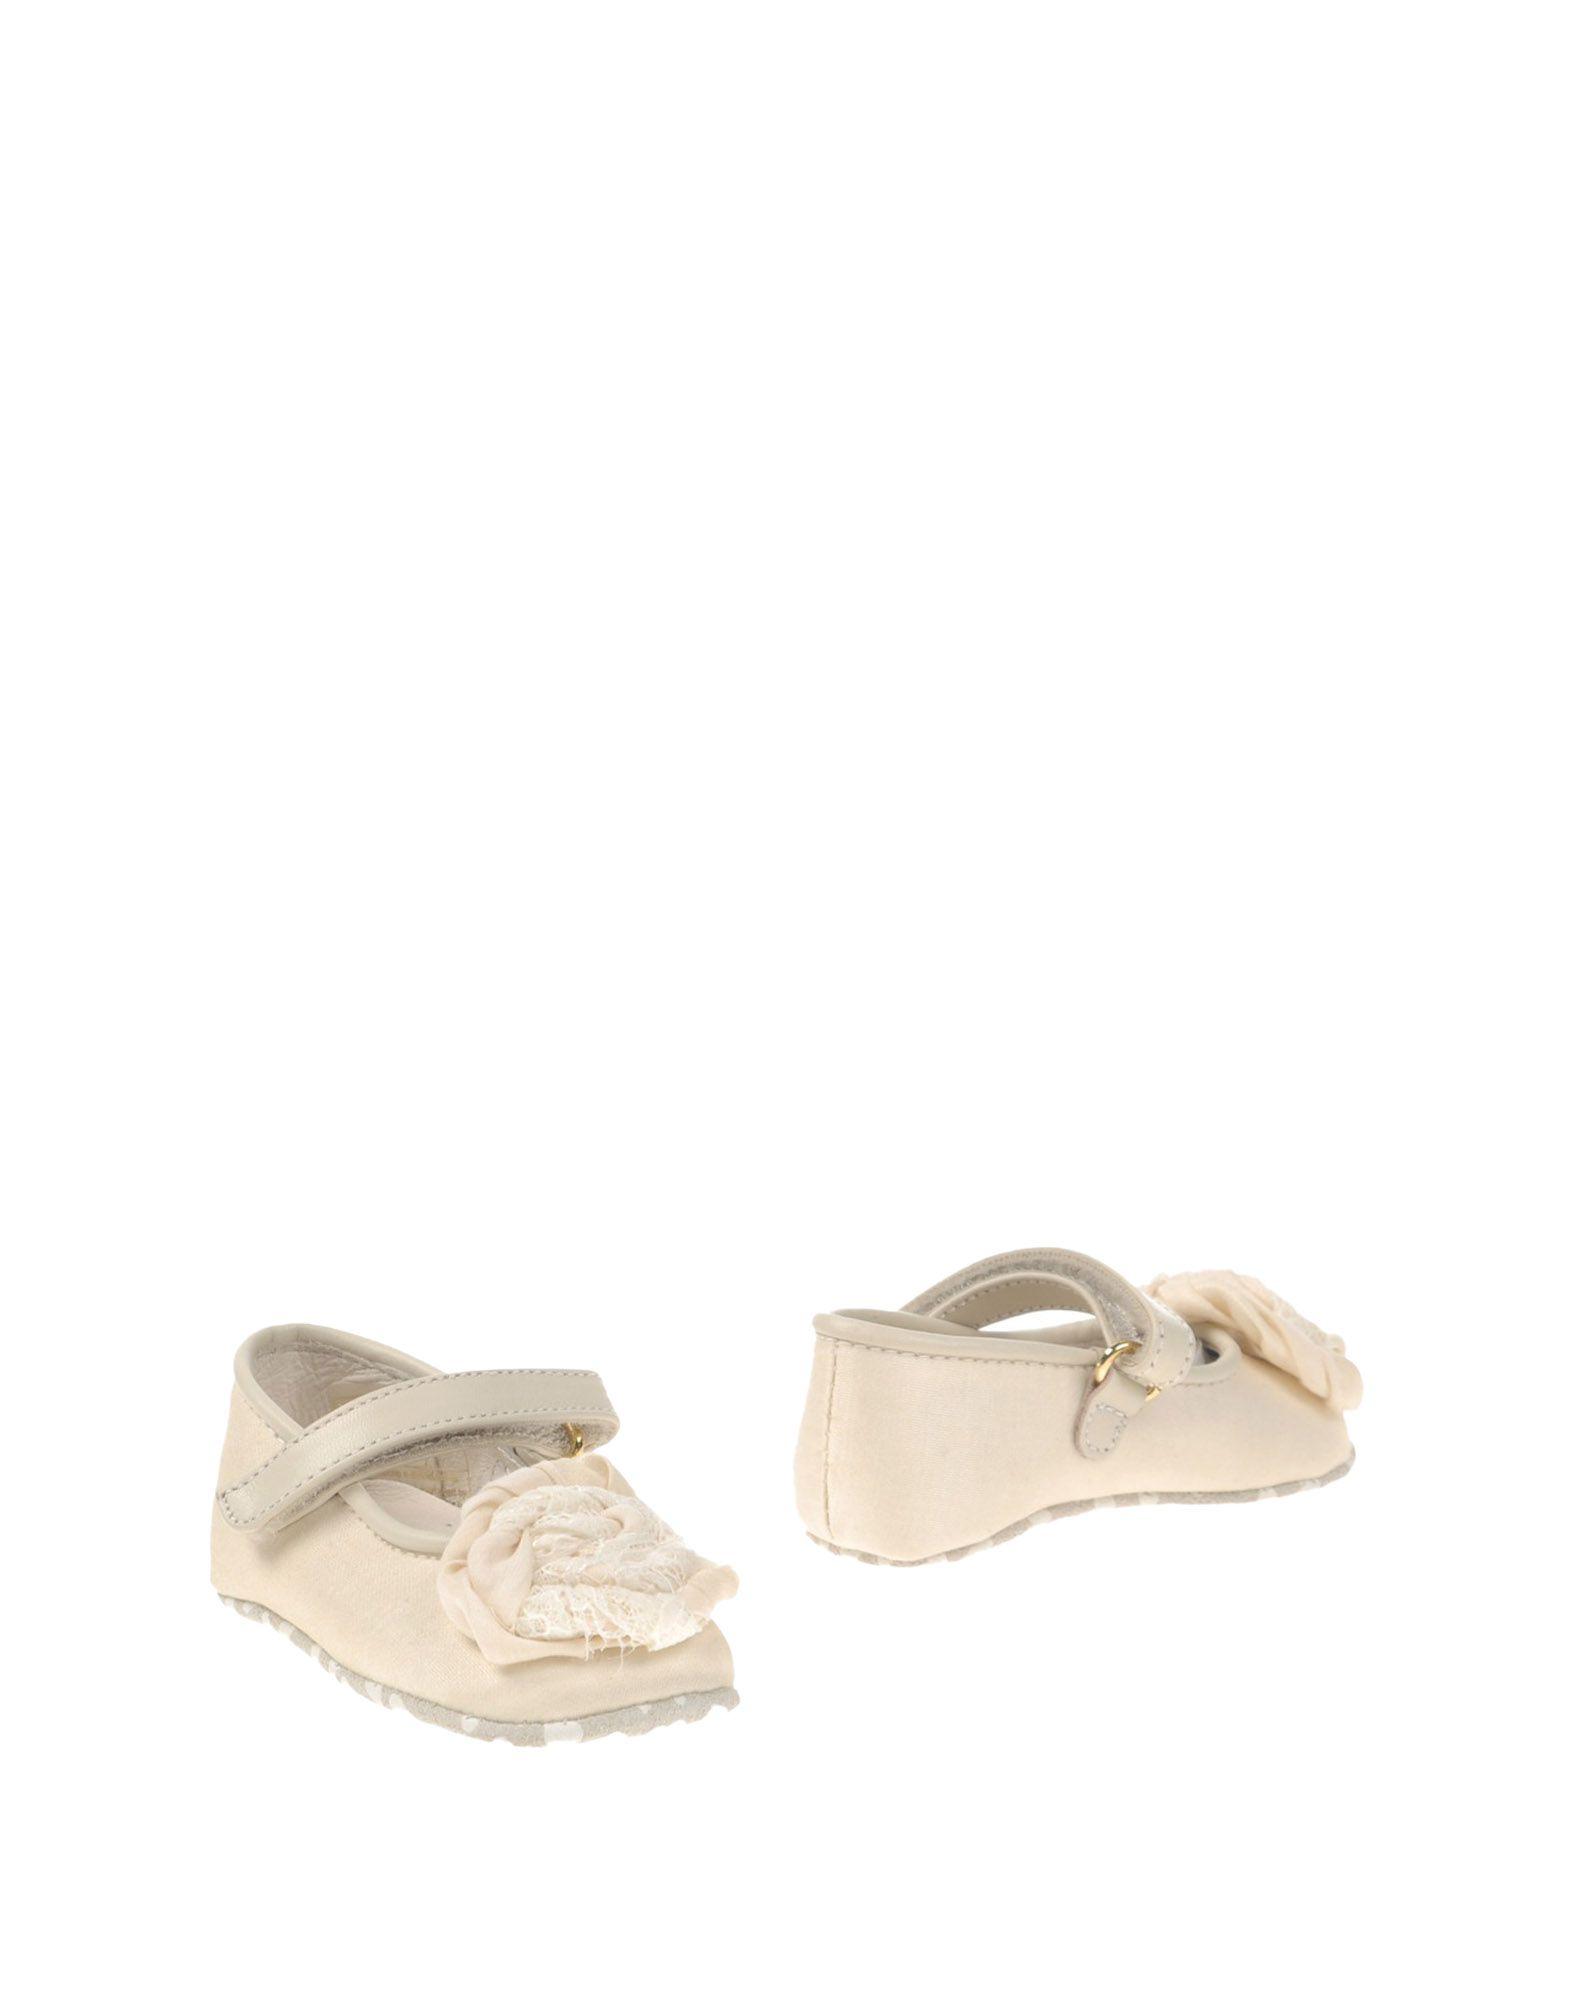 TWINSET Simona Barbieri Newborn shoes